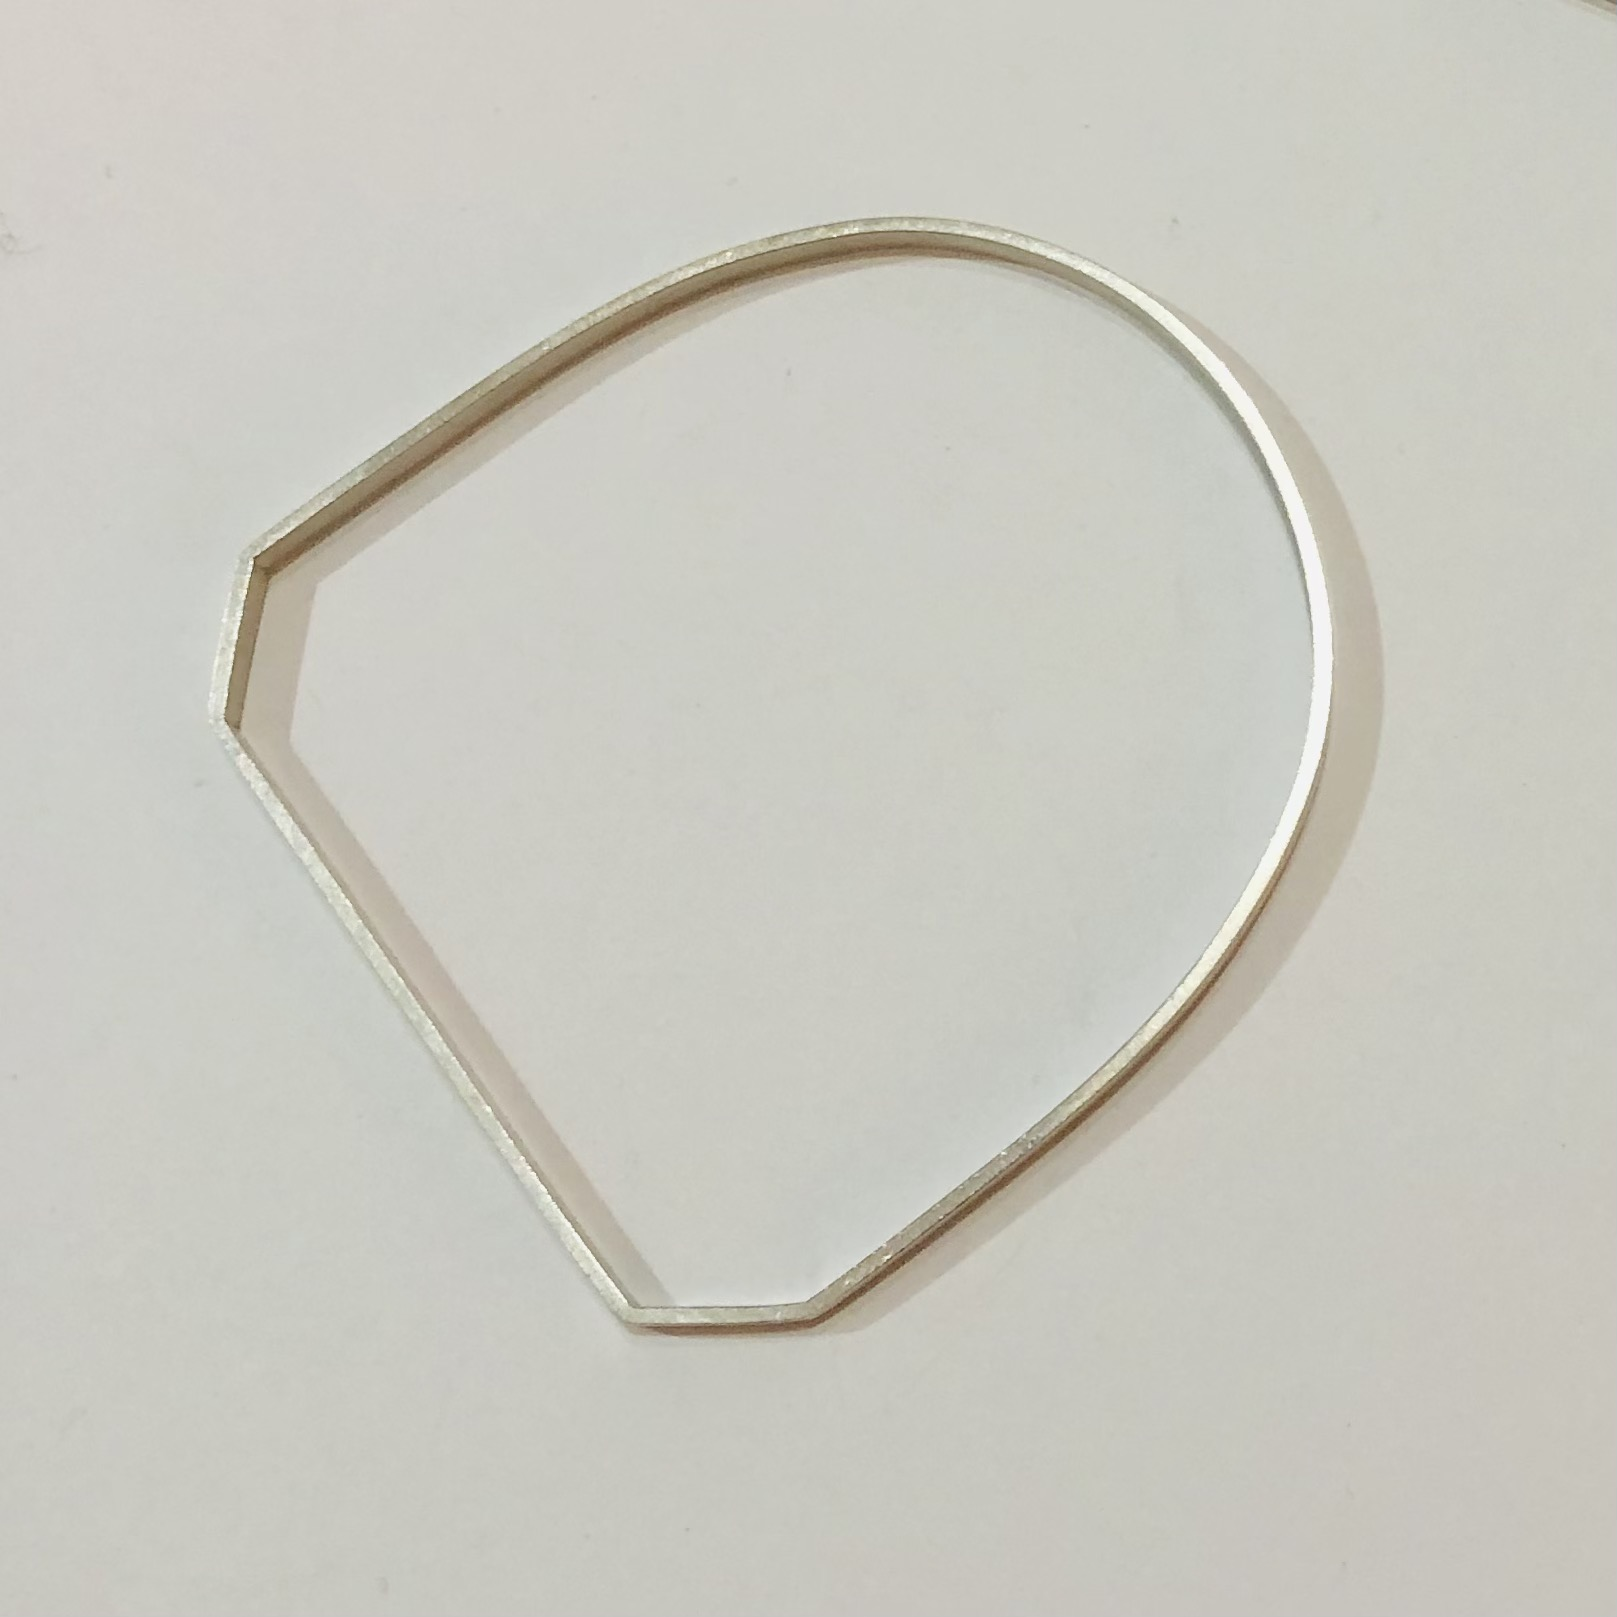 Minimal angled silver bracelet by Gracie Hinitt